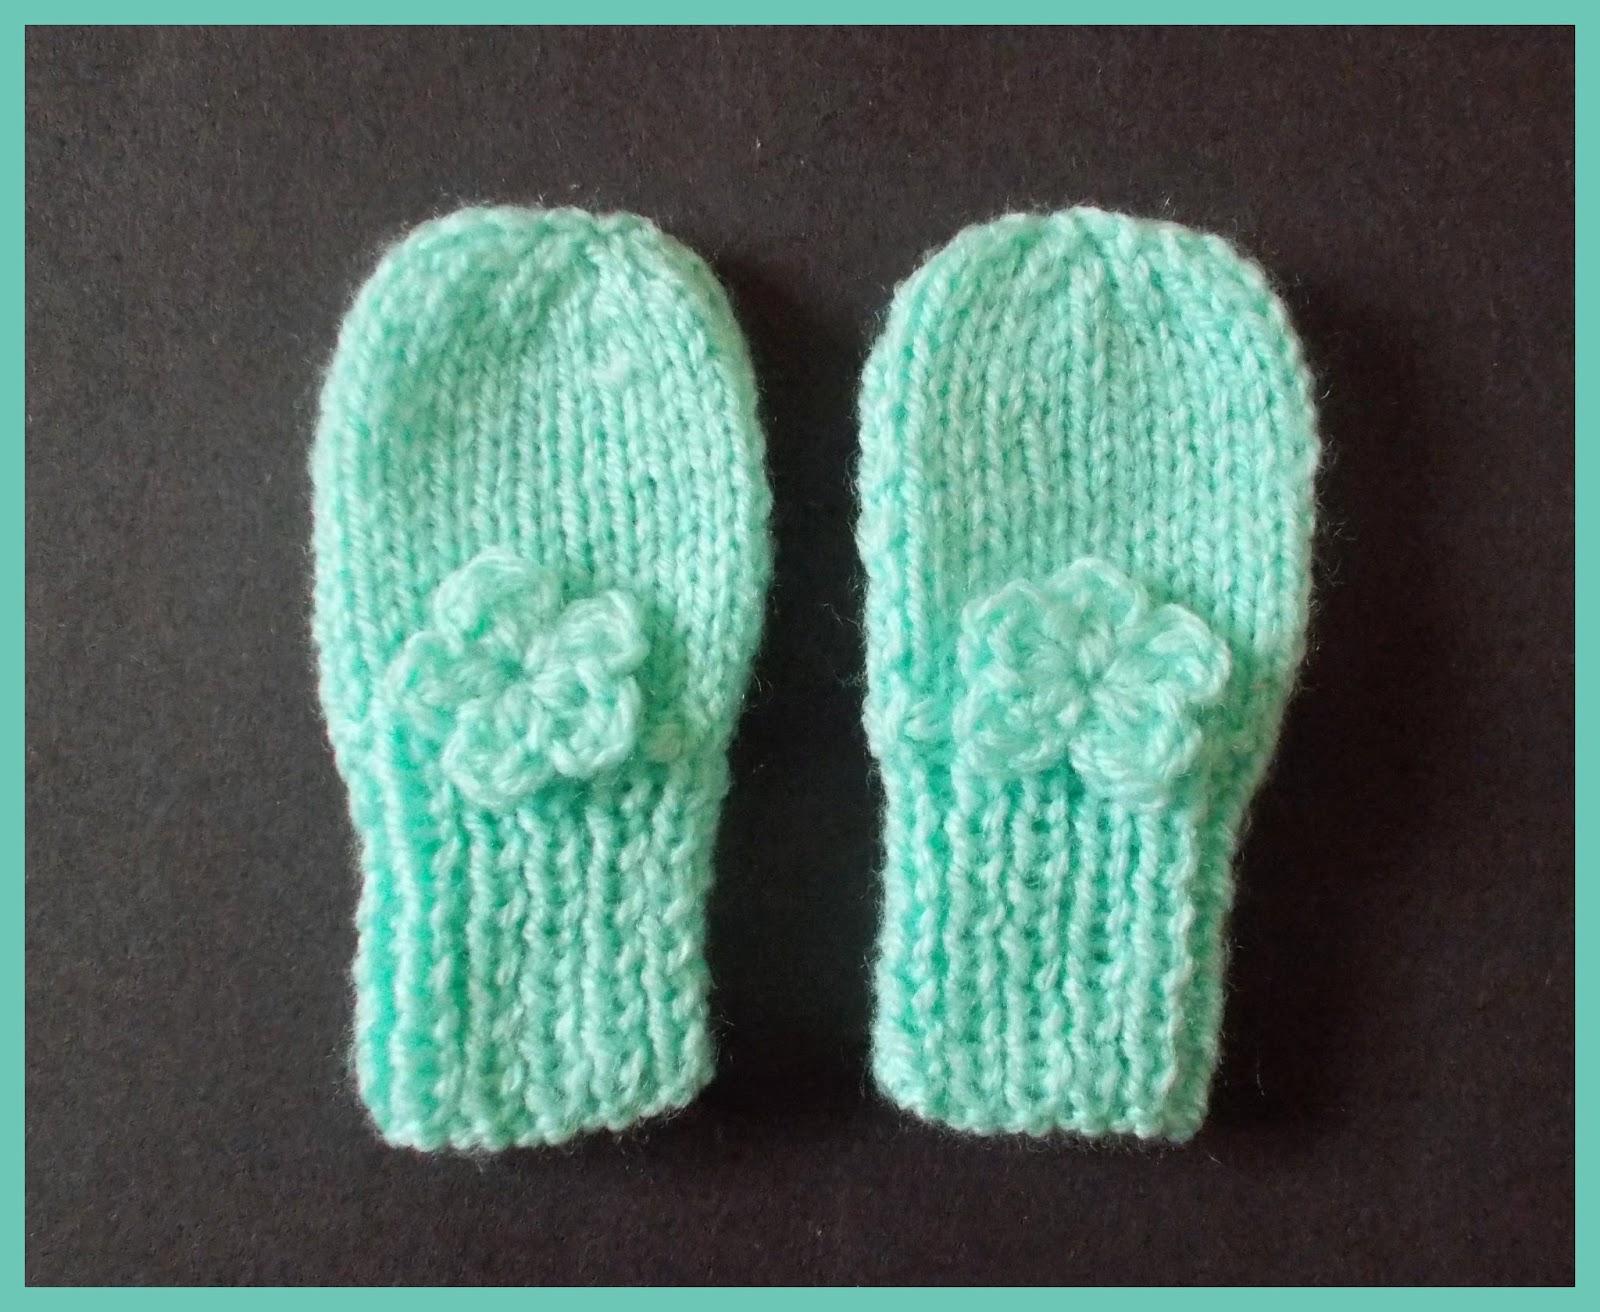 mariannas lazy daisy days: Simple Baby and Preemie Baby Mittens